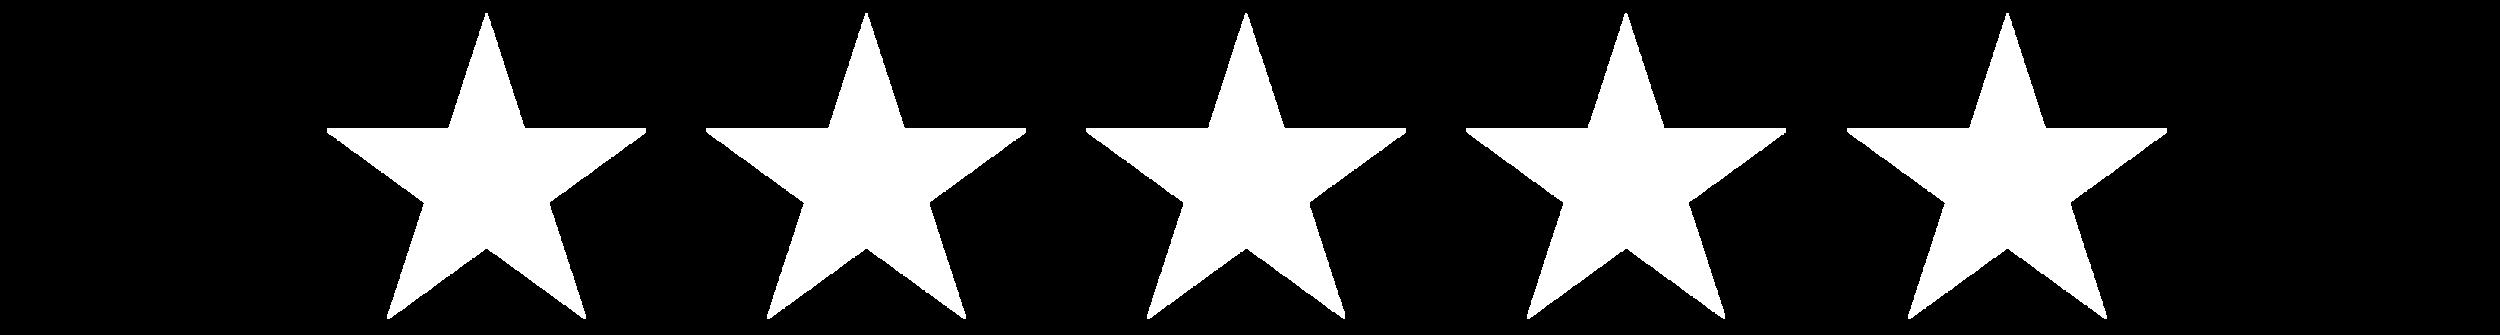 Stars-28.png